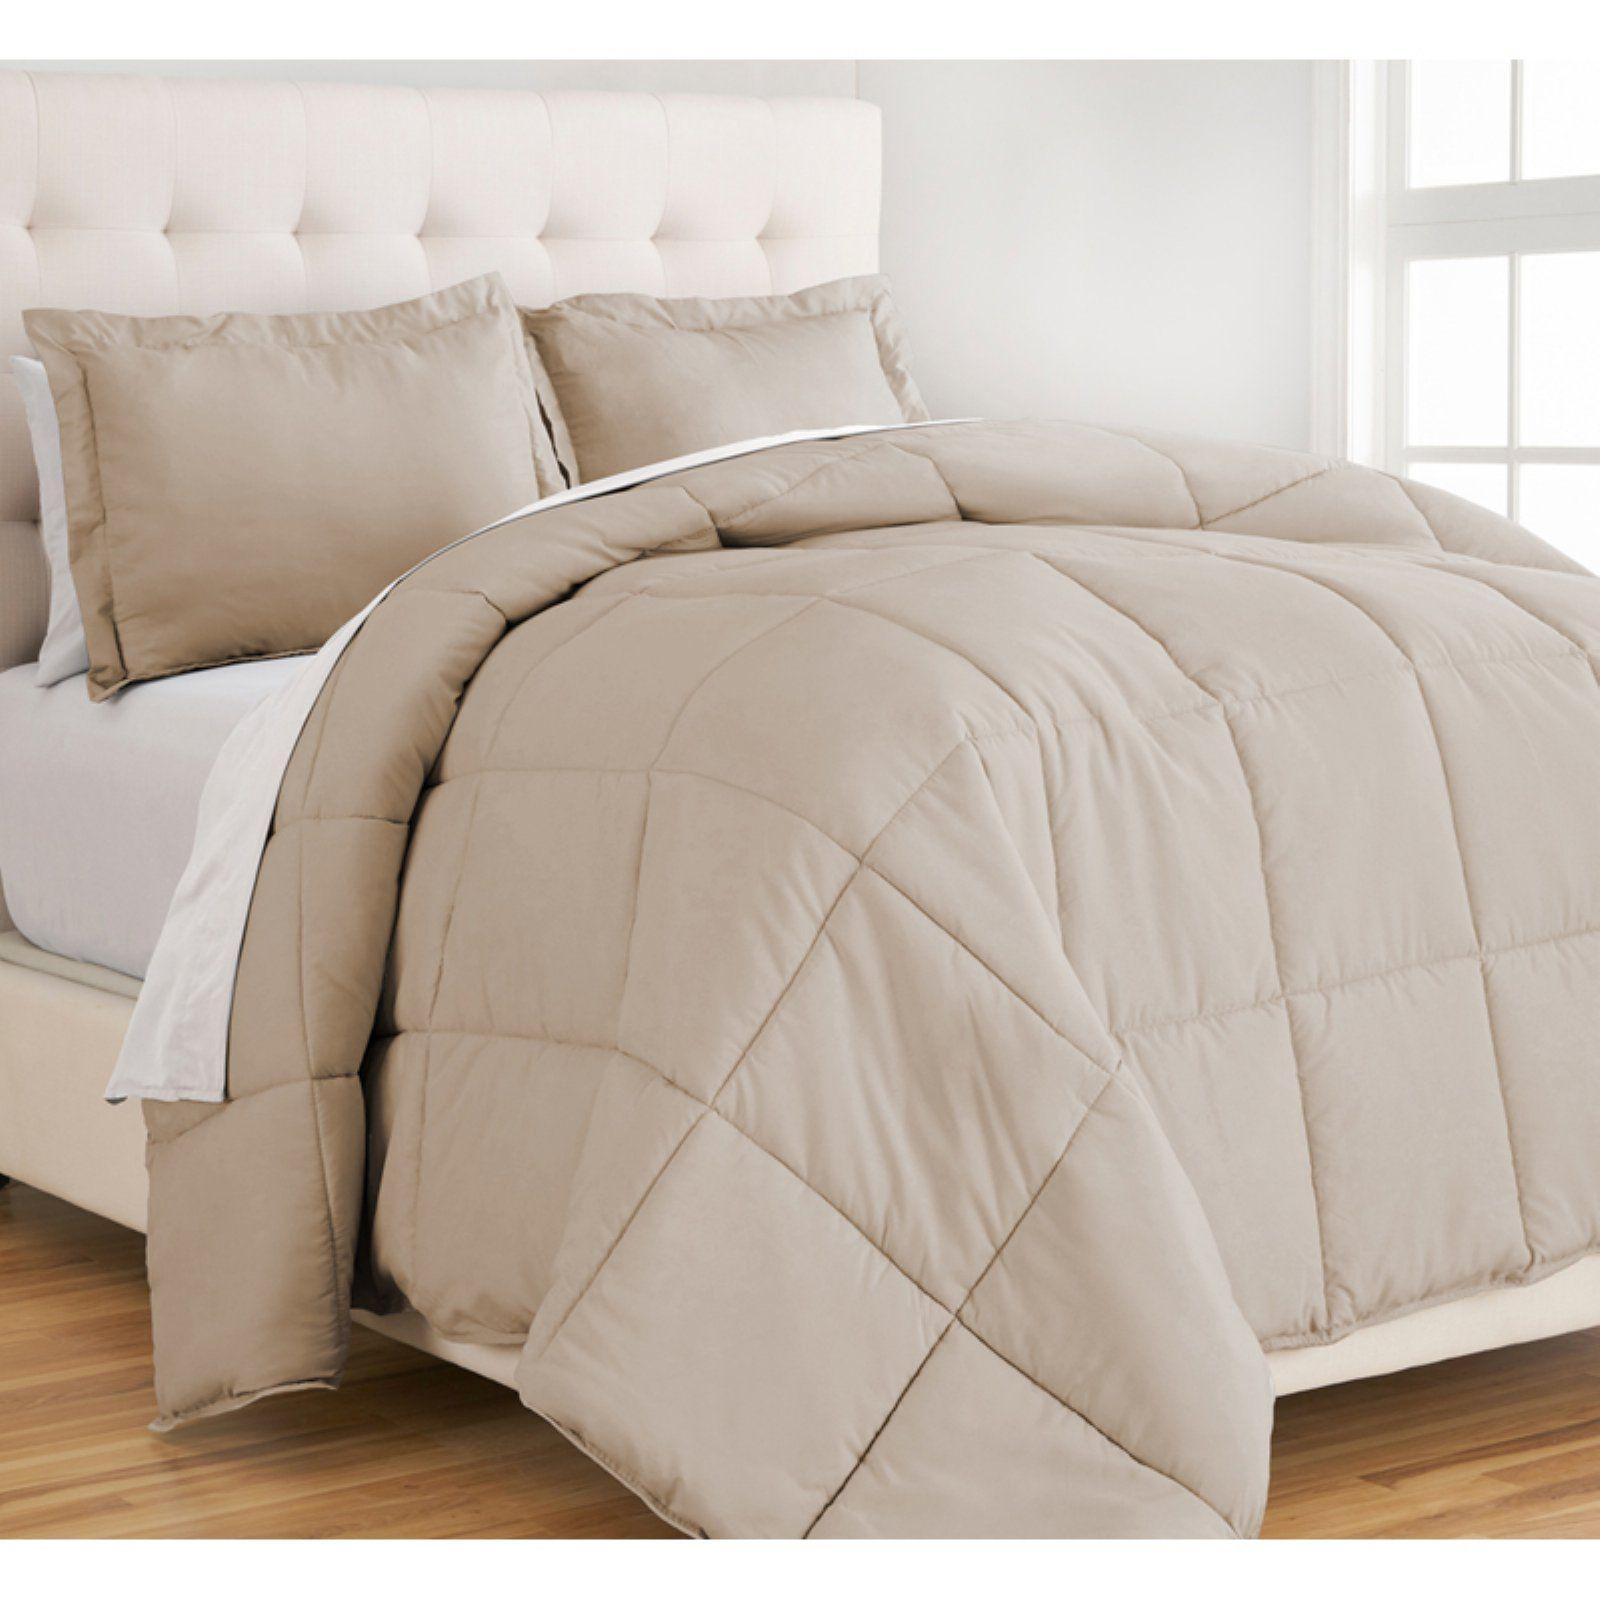 Bare Home Ultra Soft Hypoallergenic Down Alternative Comforter Set